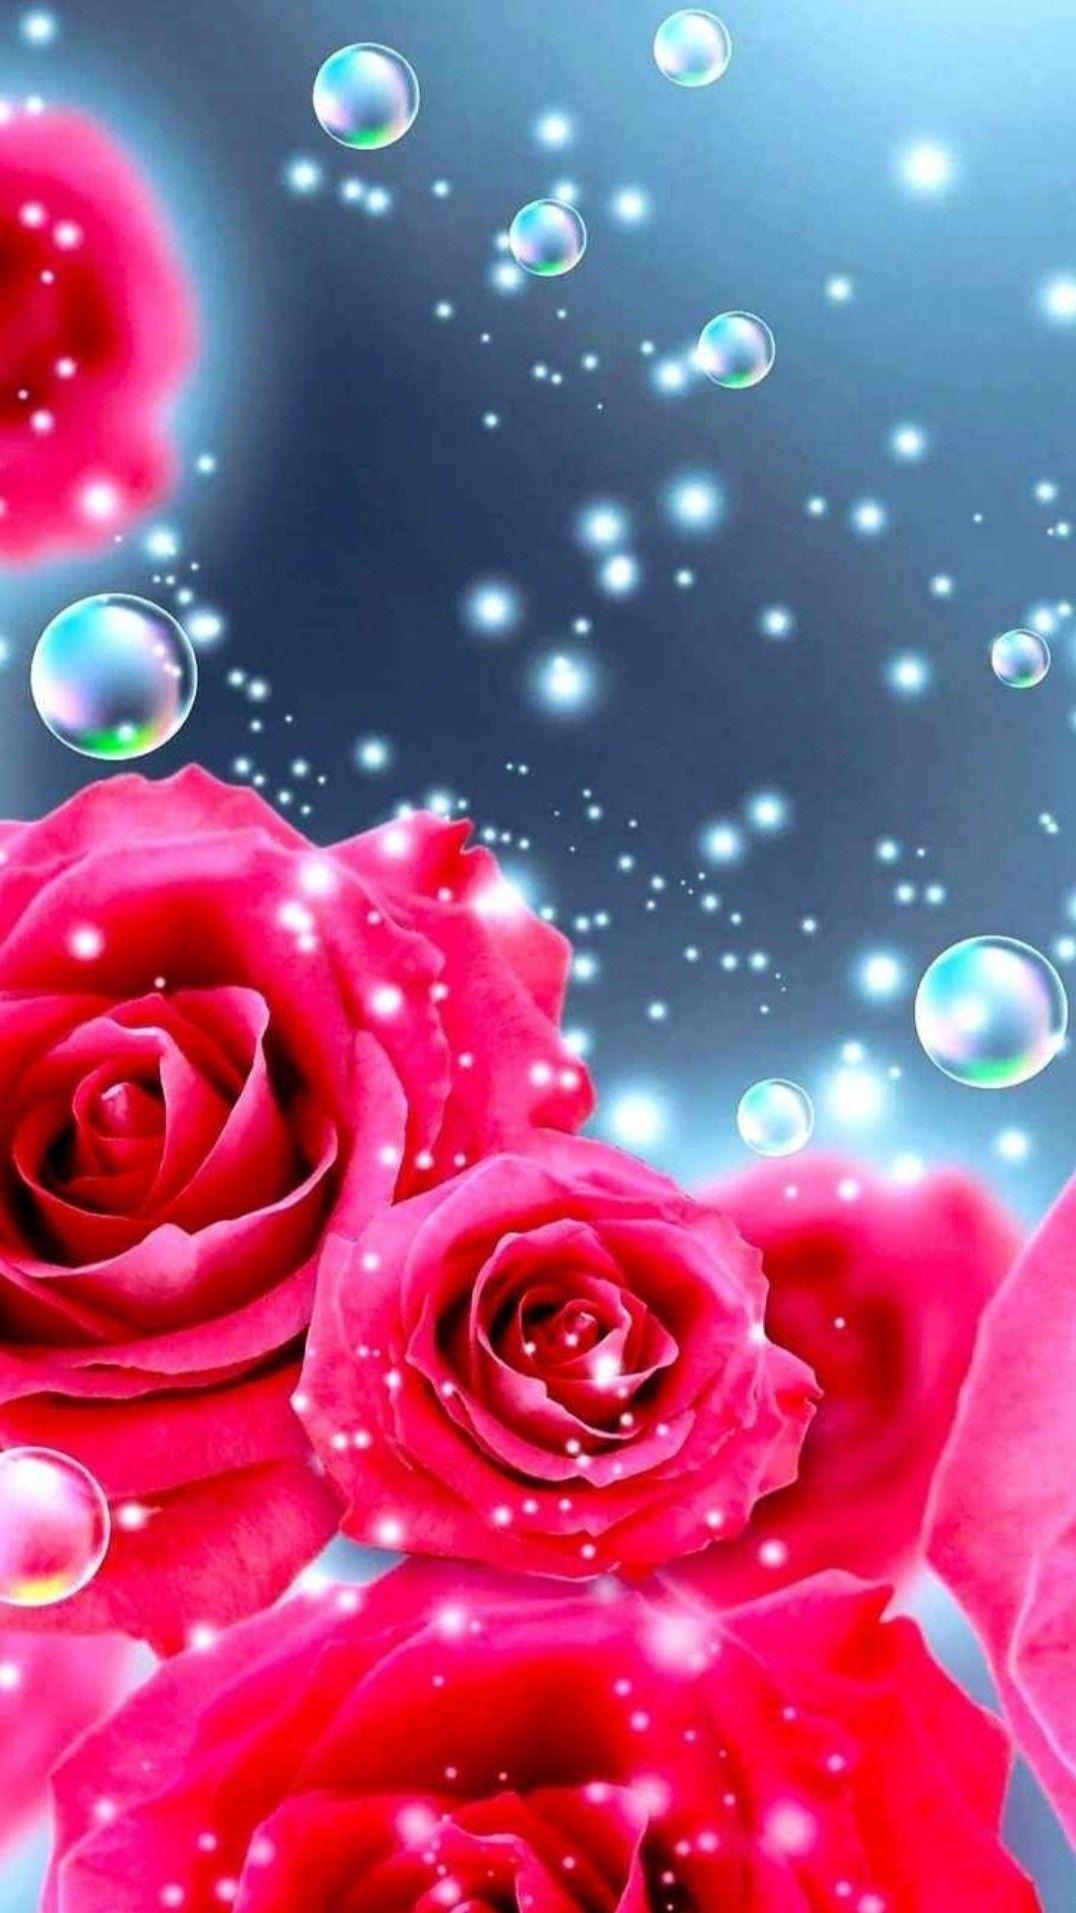 Pin By Yanett Munoz On Red Roses Flower Phone Wallpaper Cute Flower Wallpapers Rose Flower Wallpaper